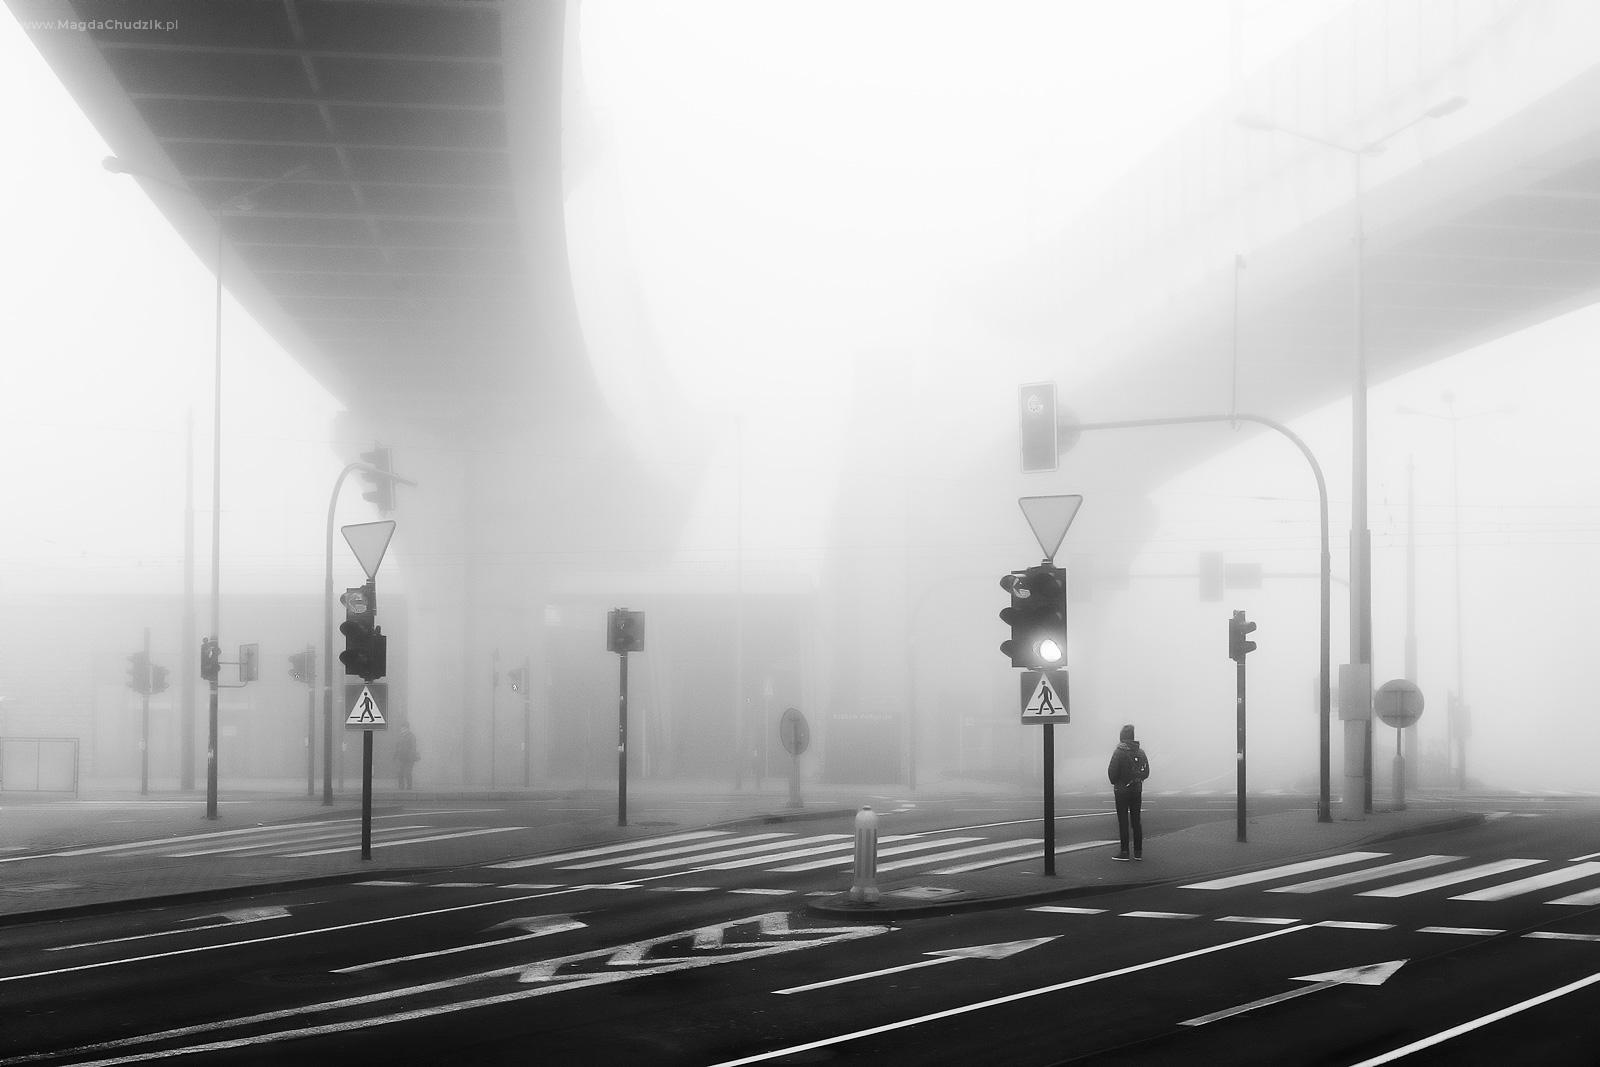 magda-chudzik-street-photography-poland-krakow-060